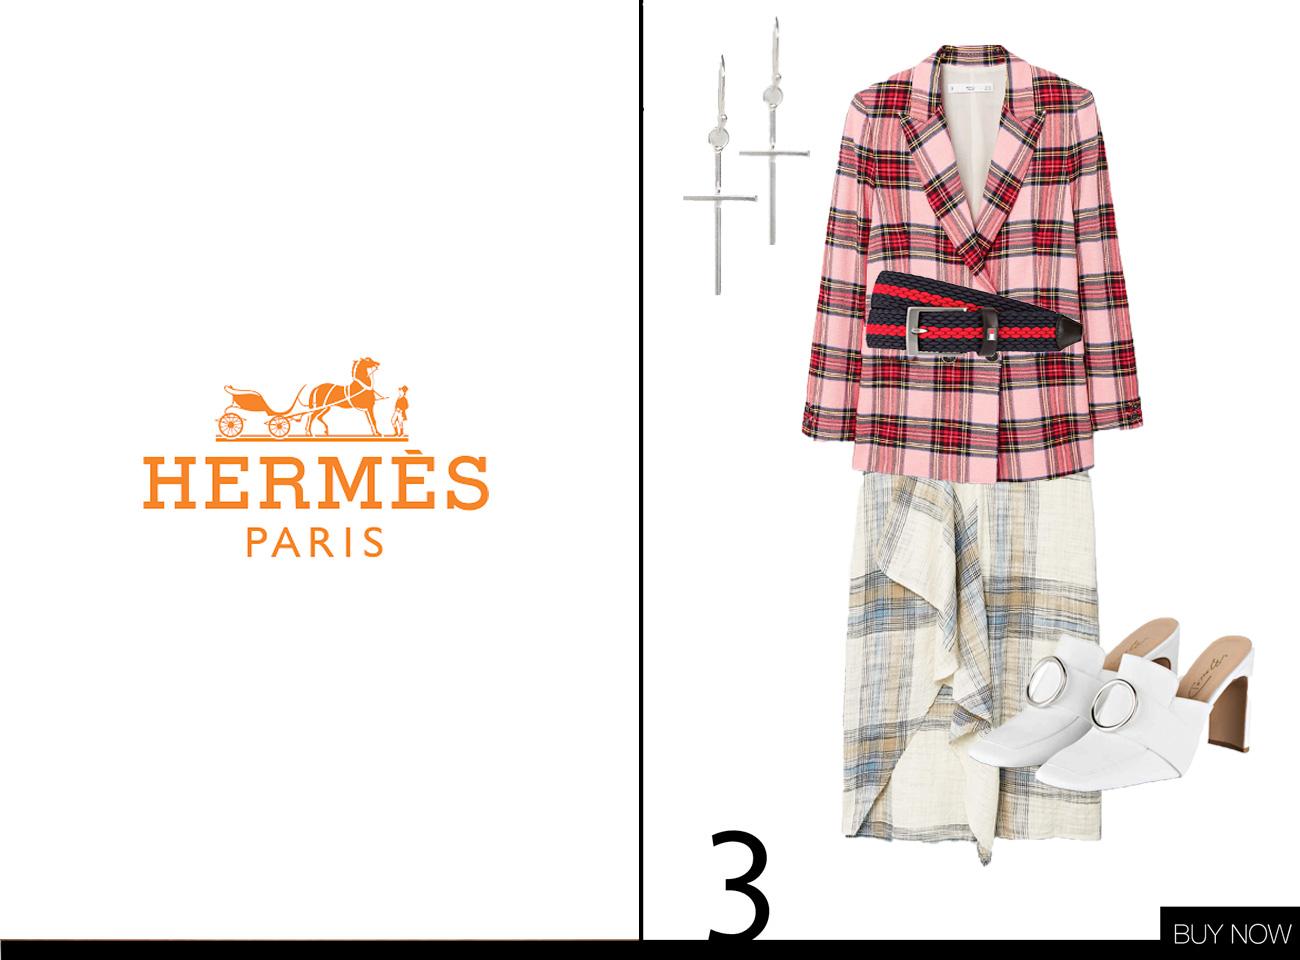 hermès Herbst Winter Kollektion 18/19 nachgestylt